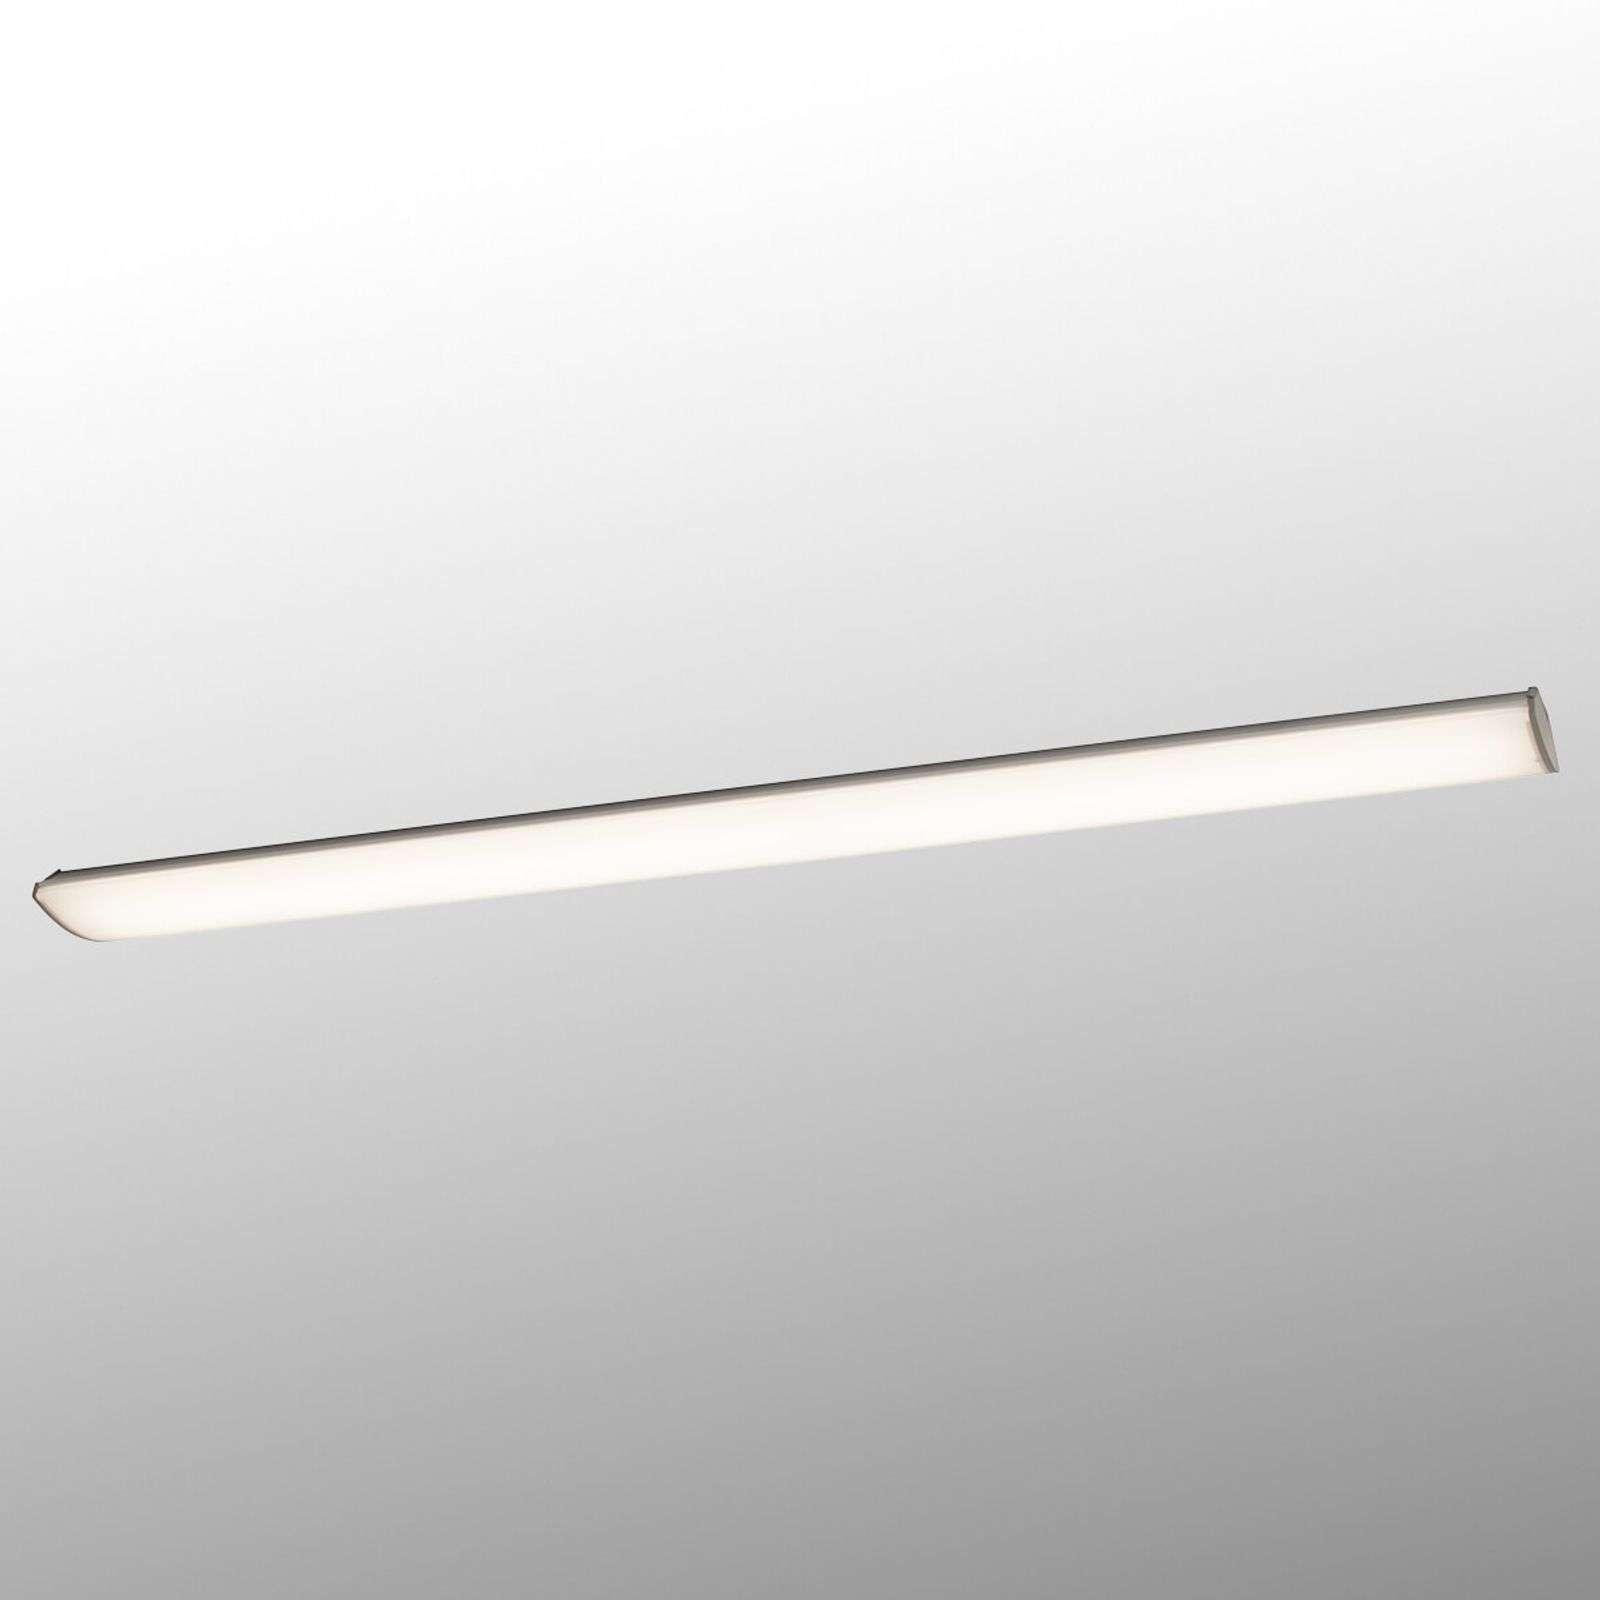 AEG Office – Plafoniera LED per ufficio